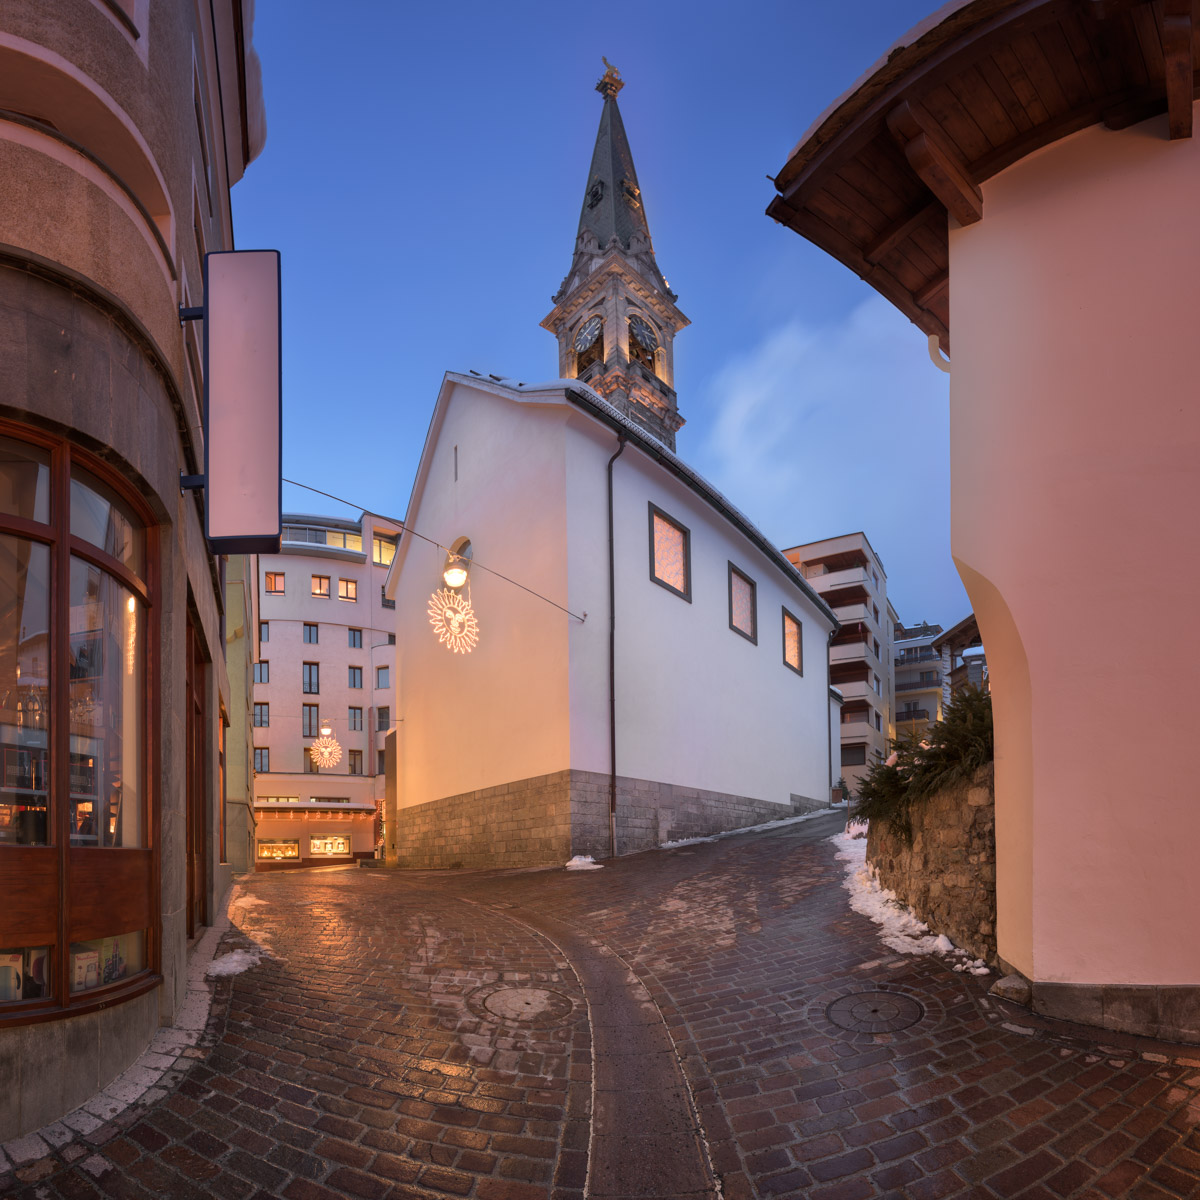 Reformed Church St Moritz, Switzerland